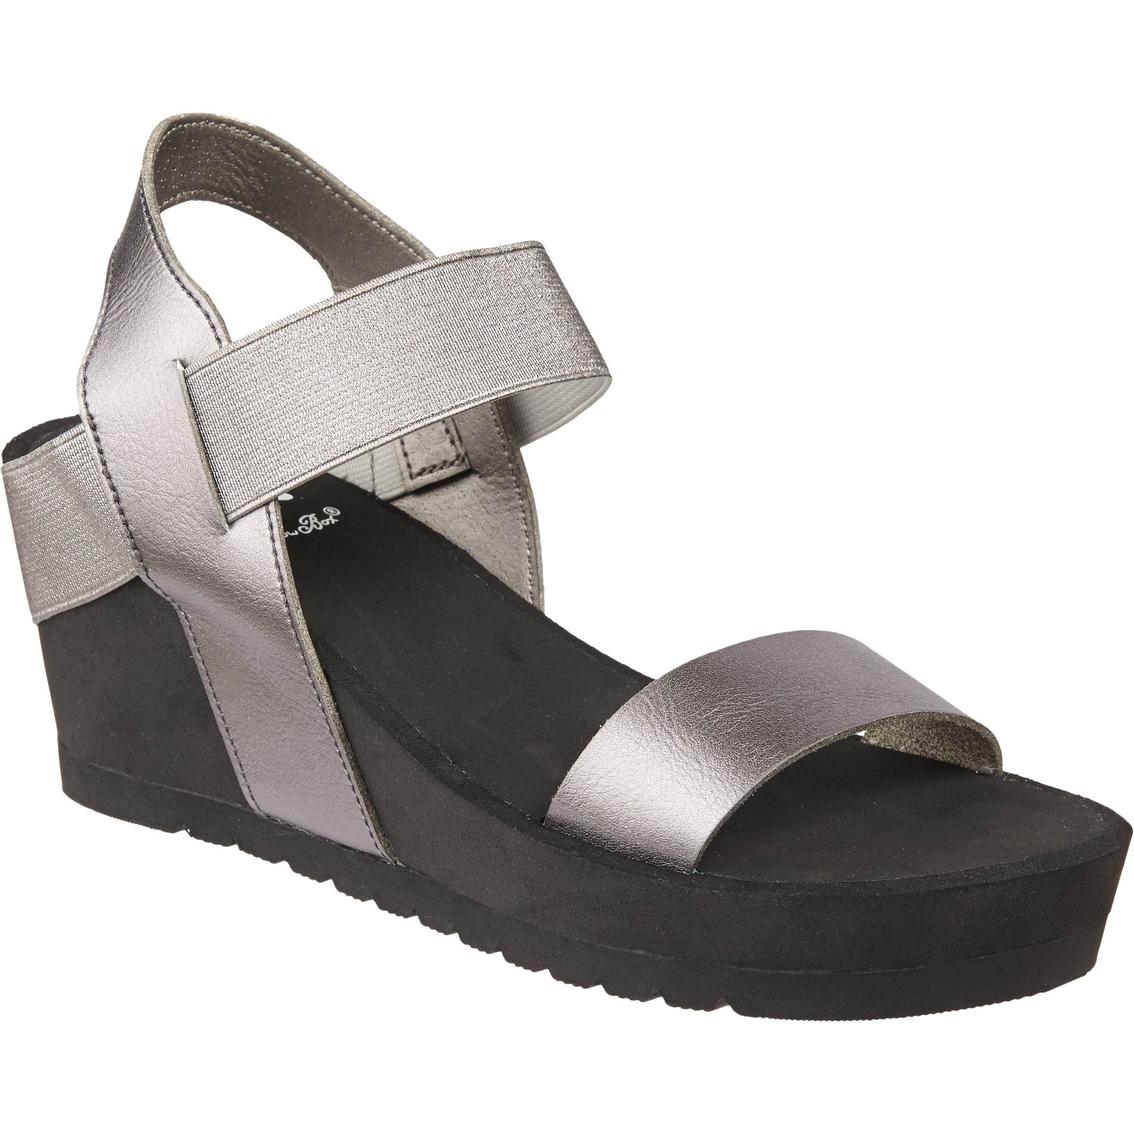 588c6c8635e Yellow Box Hayla Mid Heel Sandals